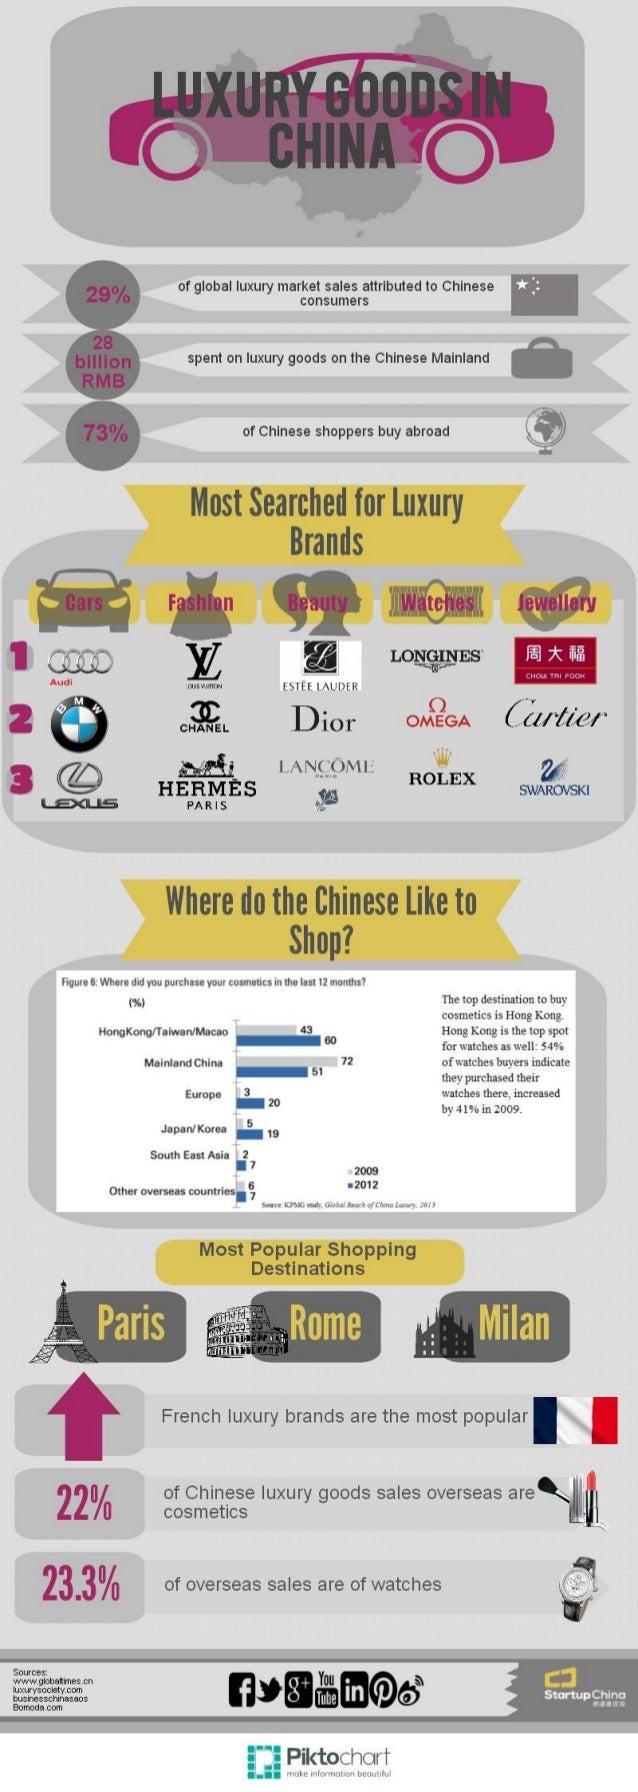 Luxury Goods in China